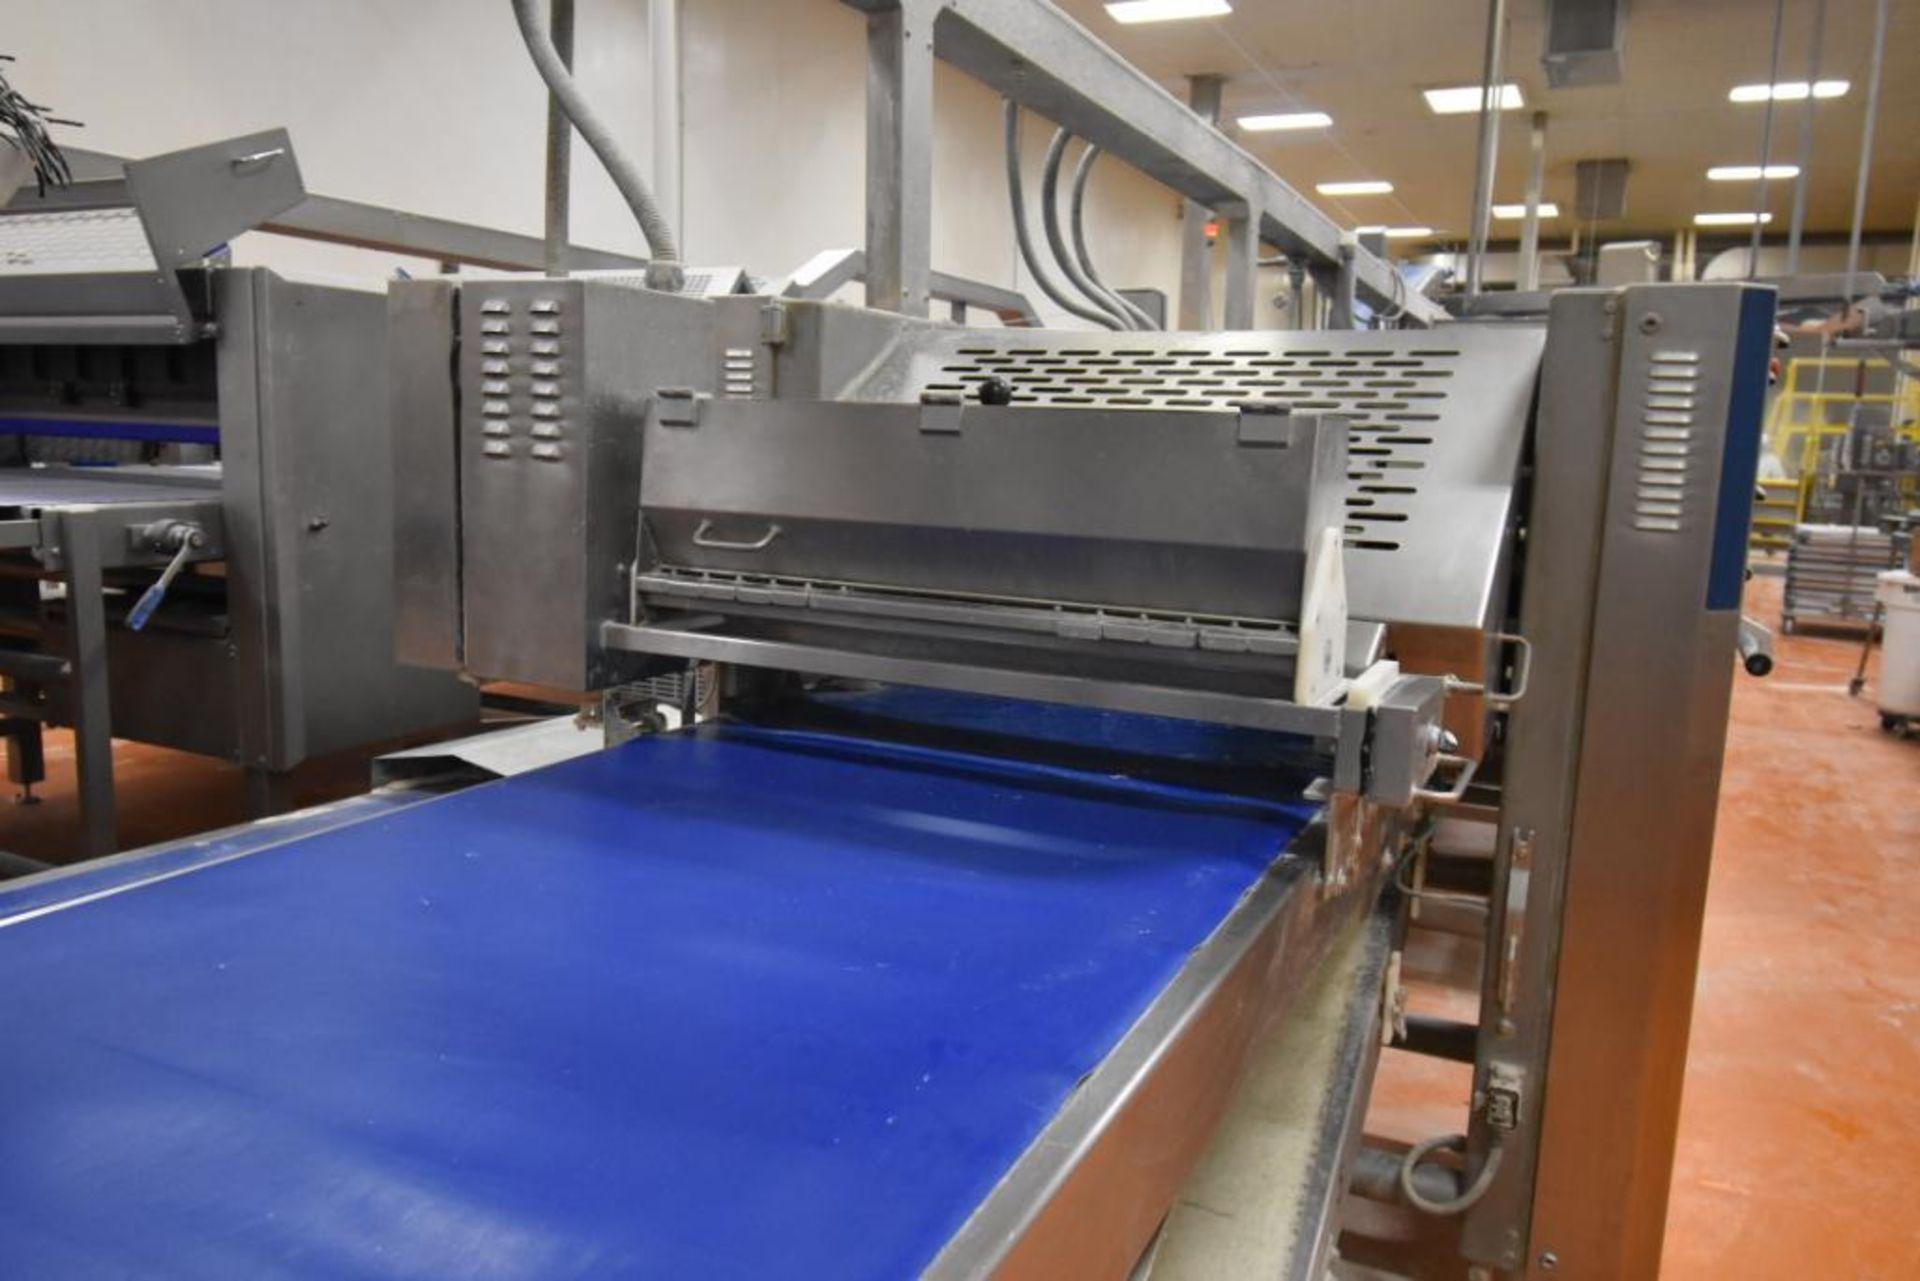 2007 Fritsch Laminator 3000 dough line - Image 57 of 280